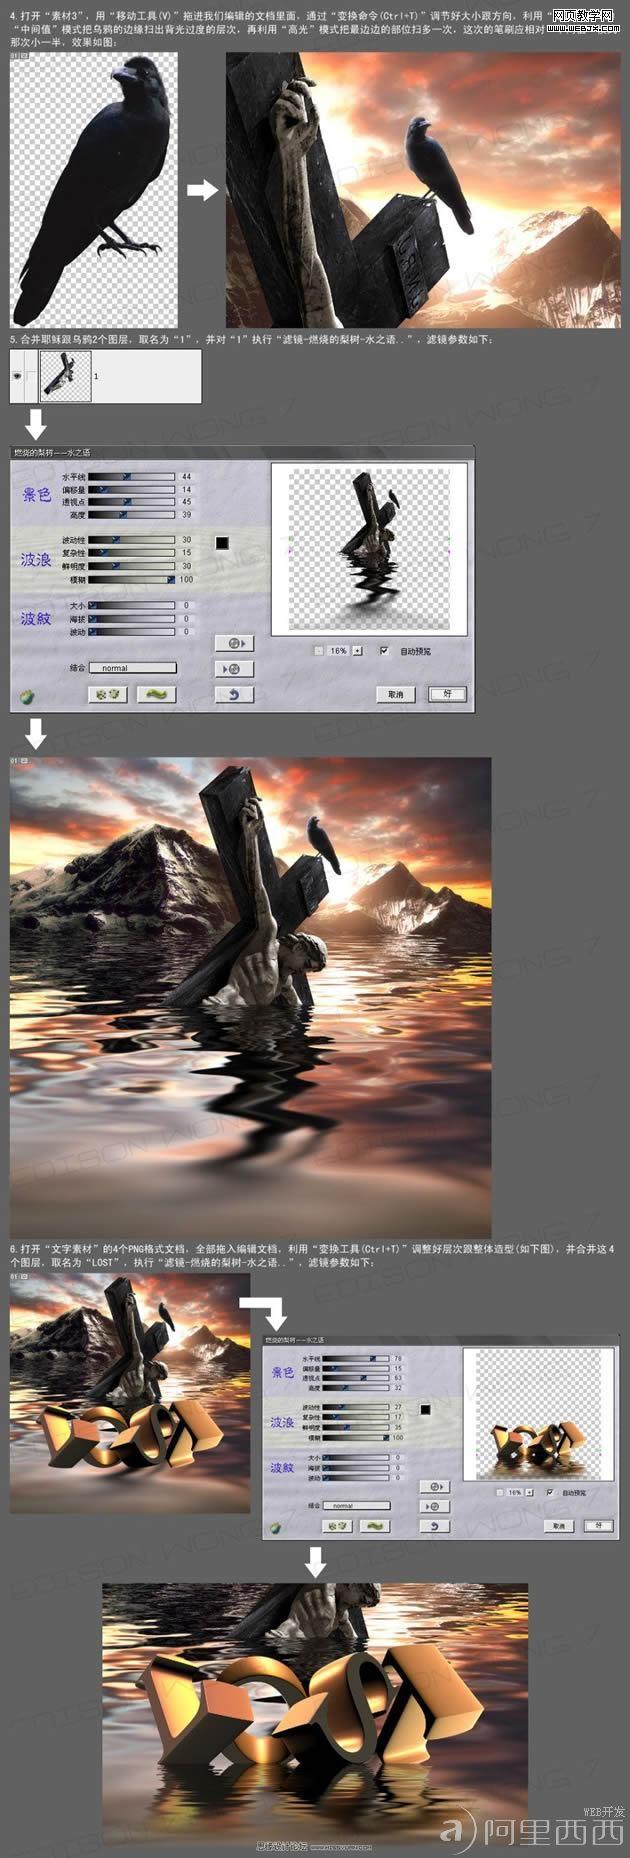 photoshop合成超创意作品 - 百科教程网_经验分享平台